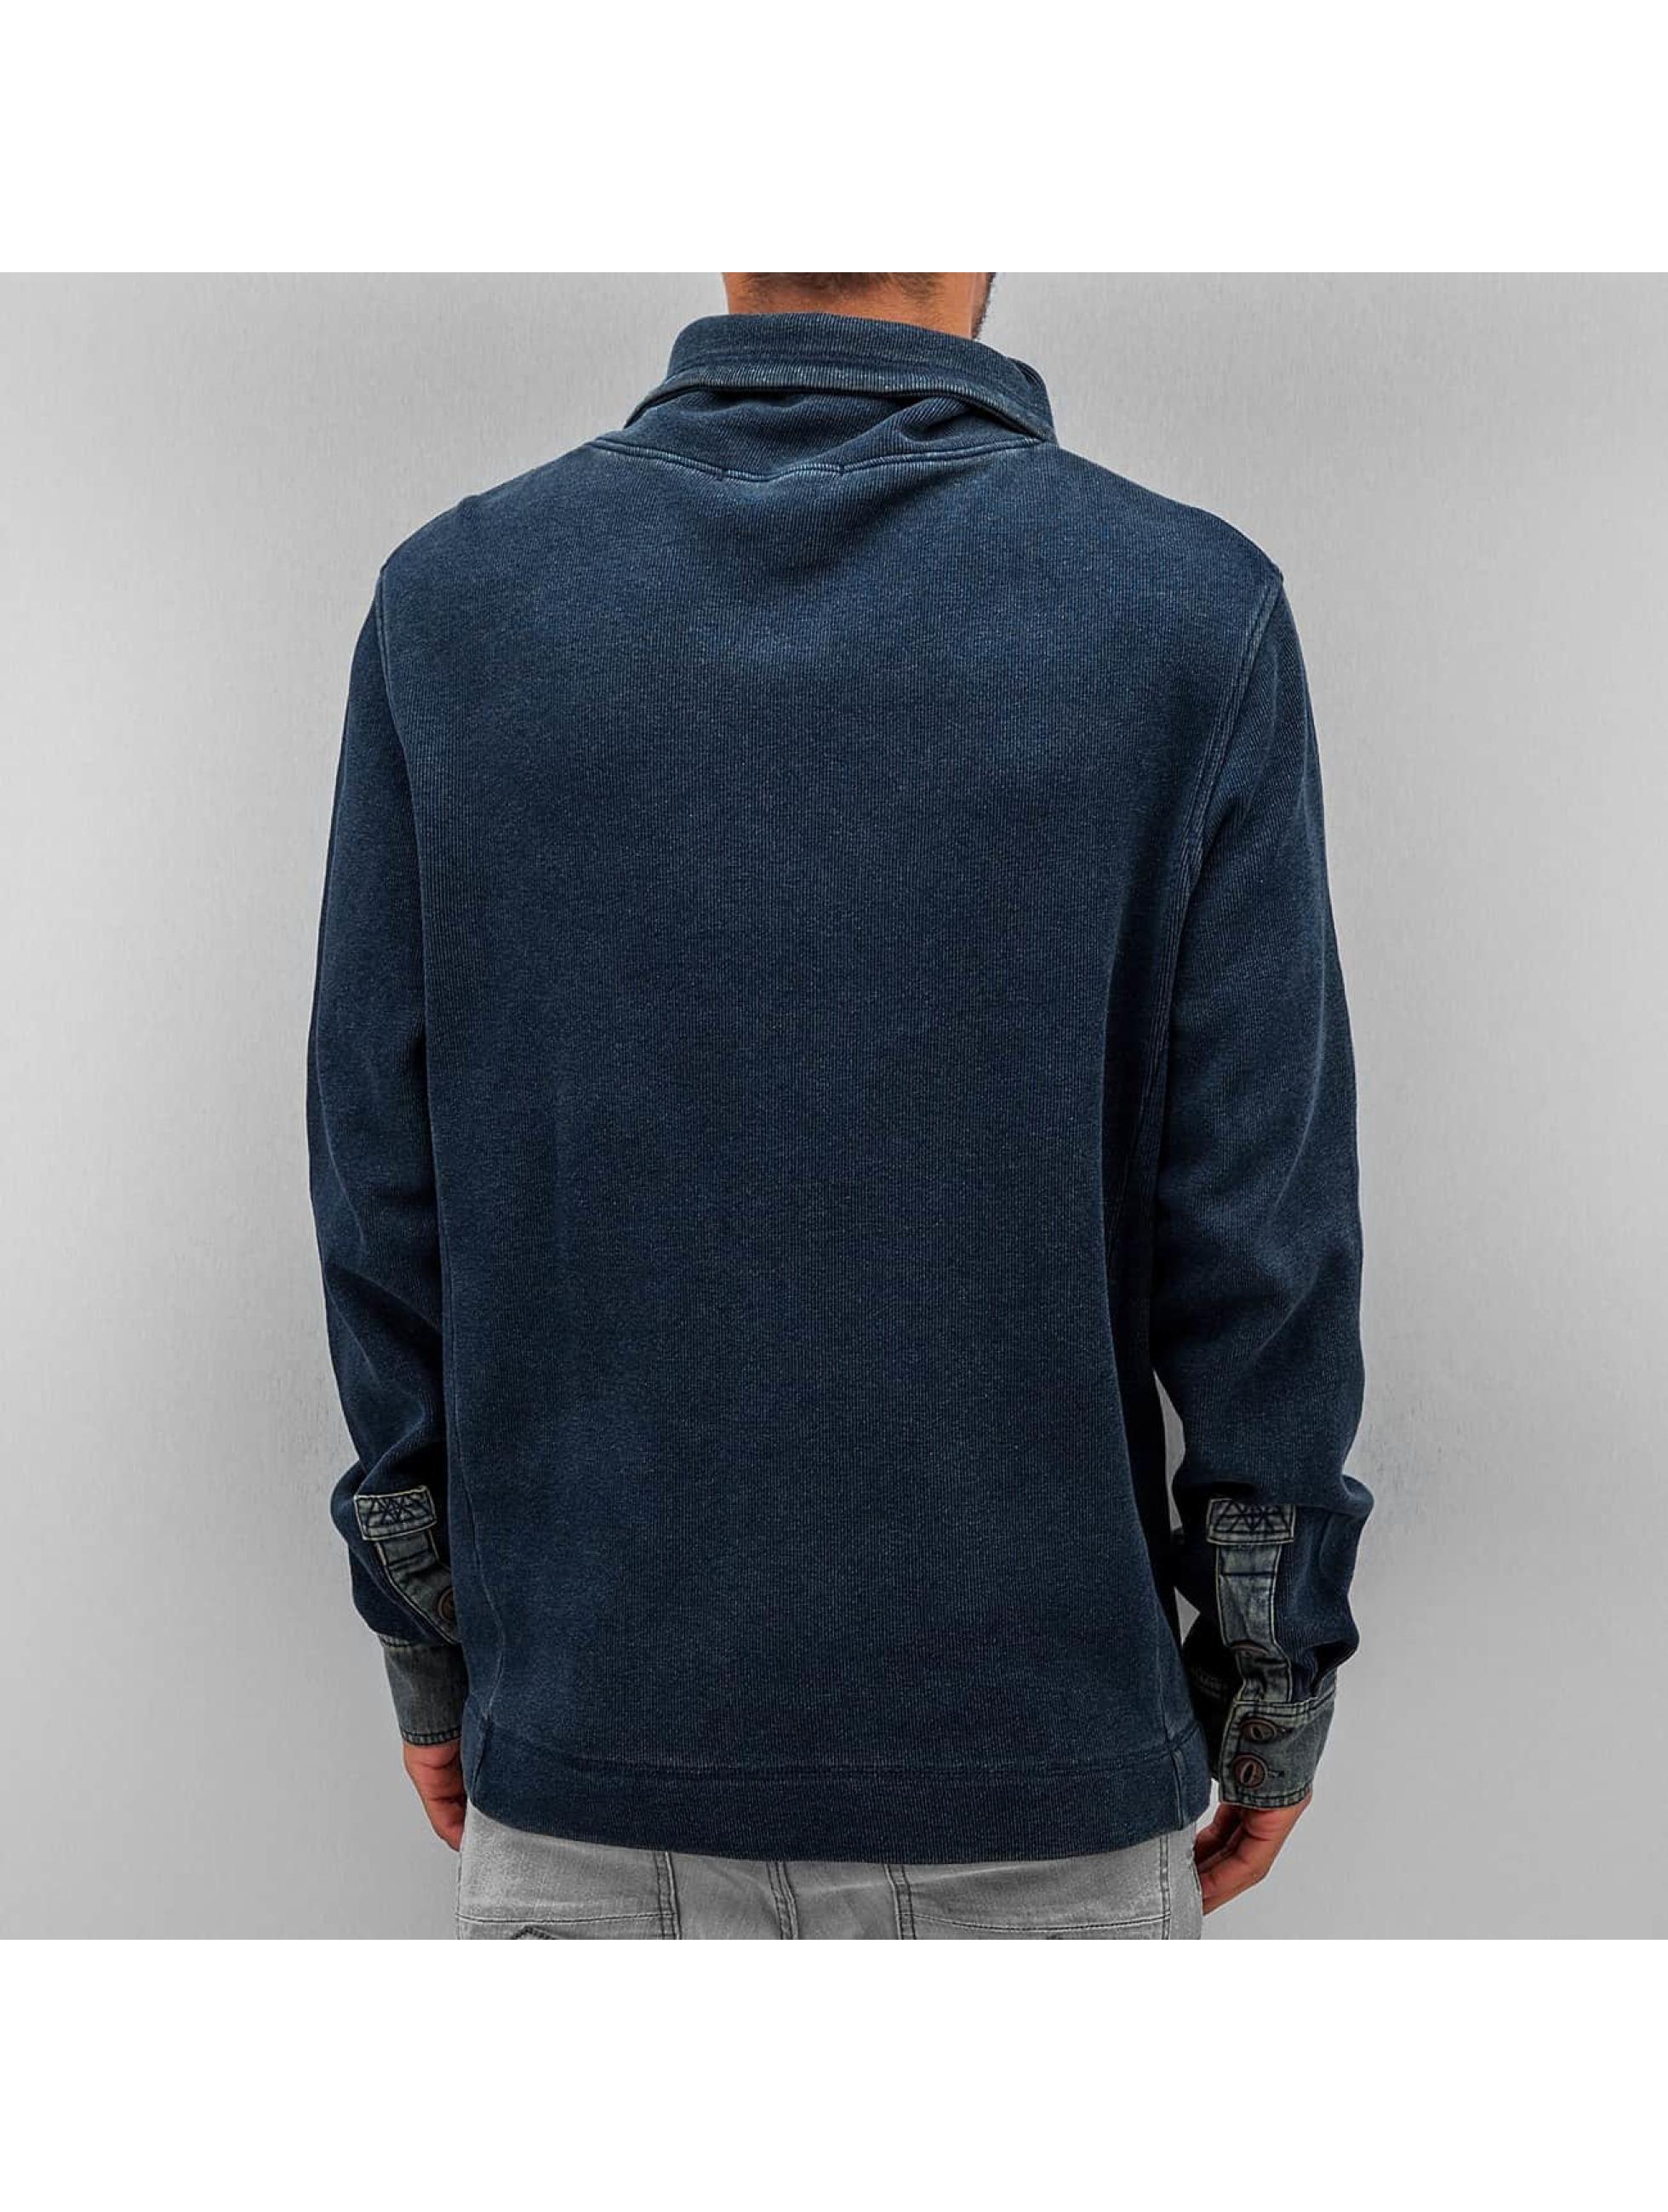 Amsterdenim Transitional Jackets Boris indigo